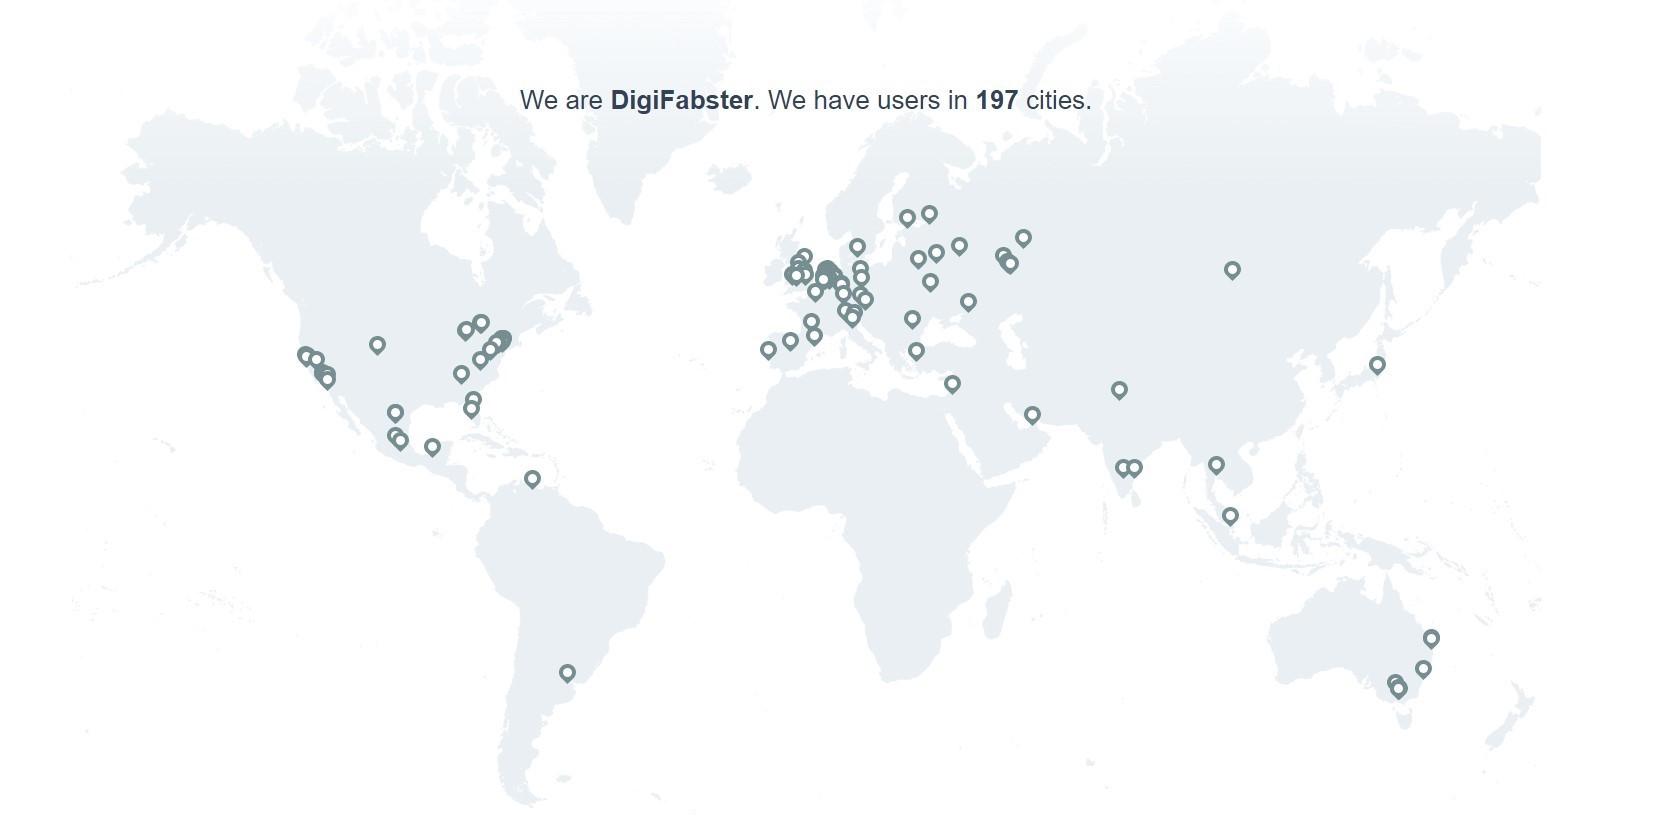 [Обзор] Сервис обработки заказов 3D-печати Digifabster - 13